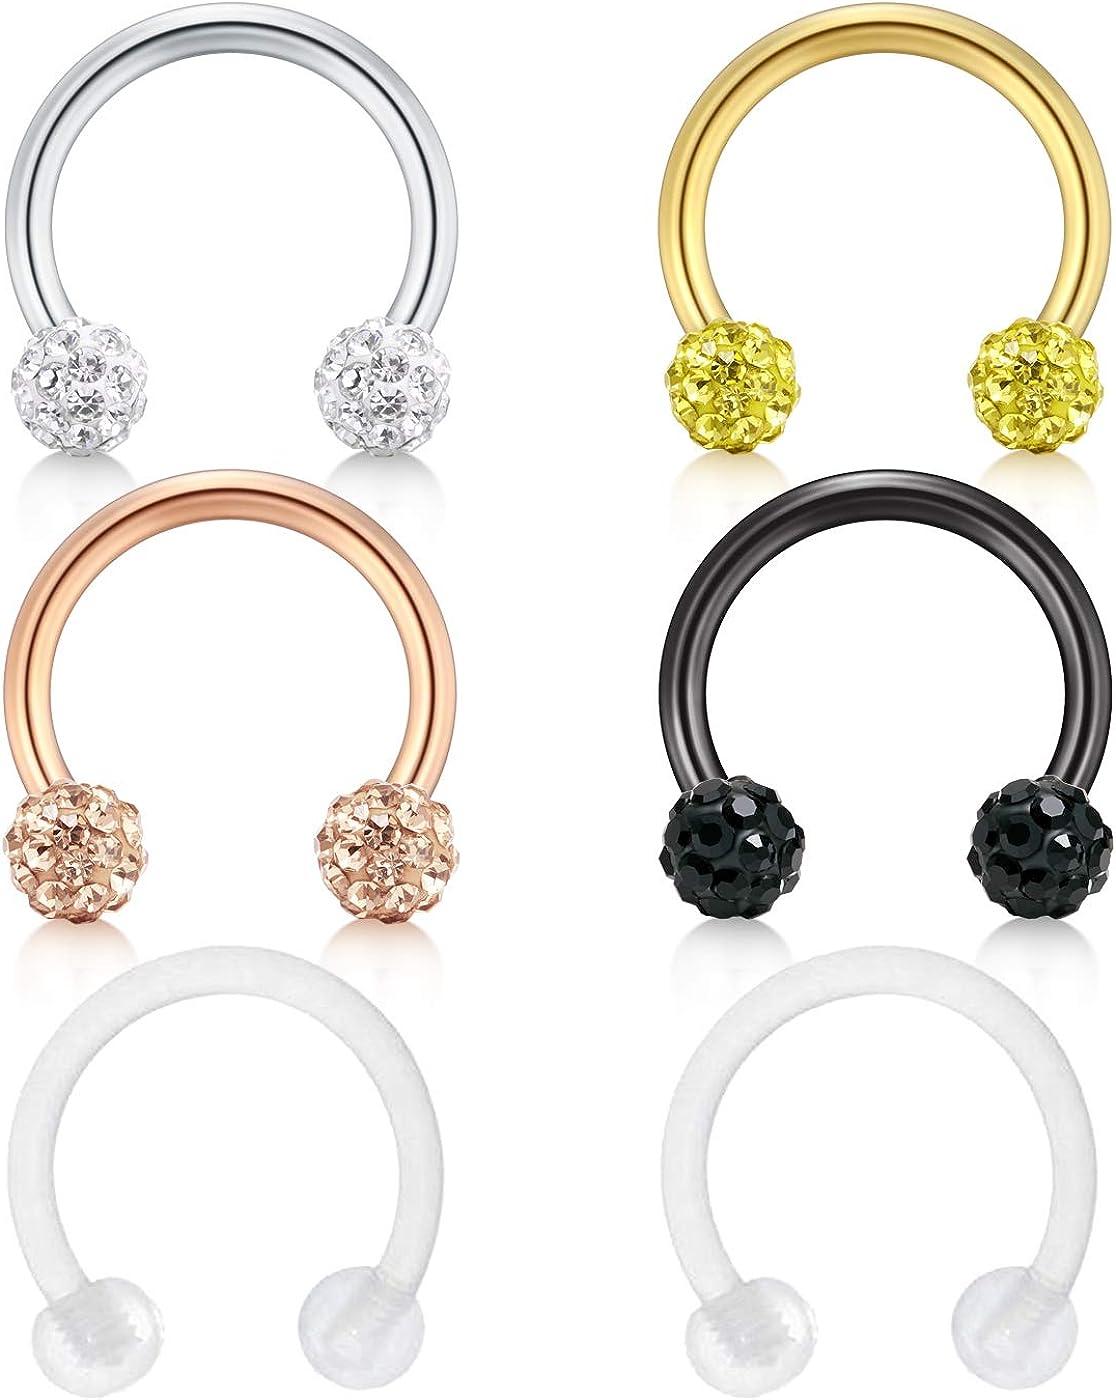 Zolure 16g 10mm Stainless Steel Crystal Ball Tragus Earrings